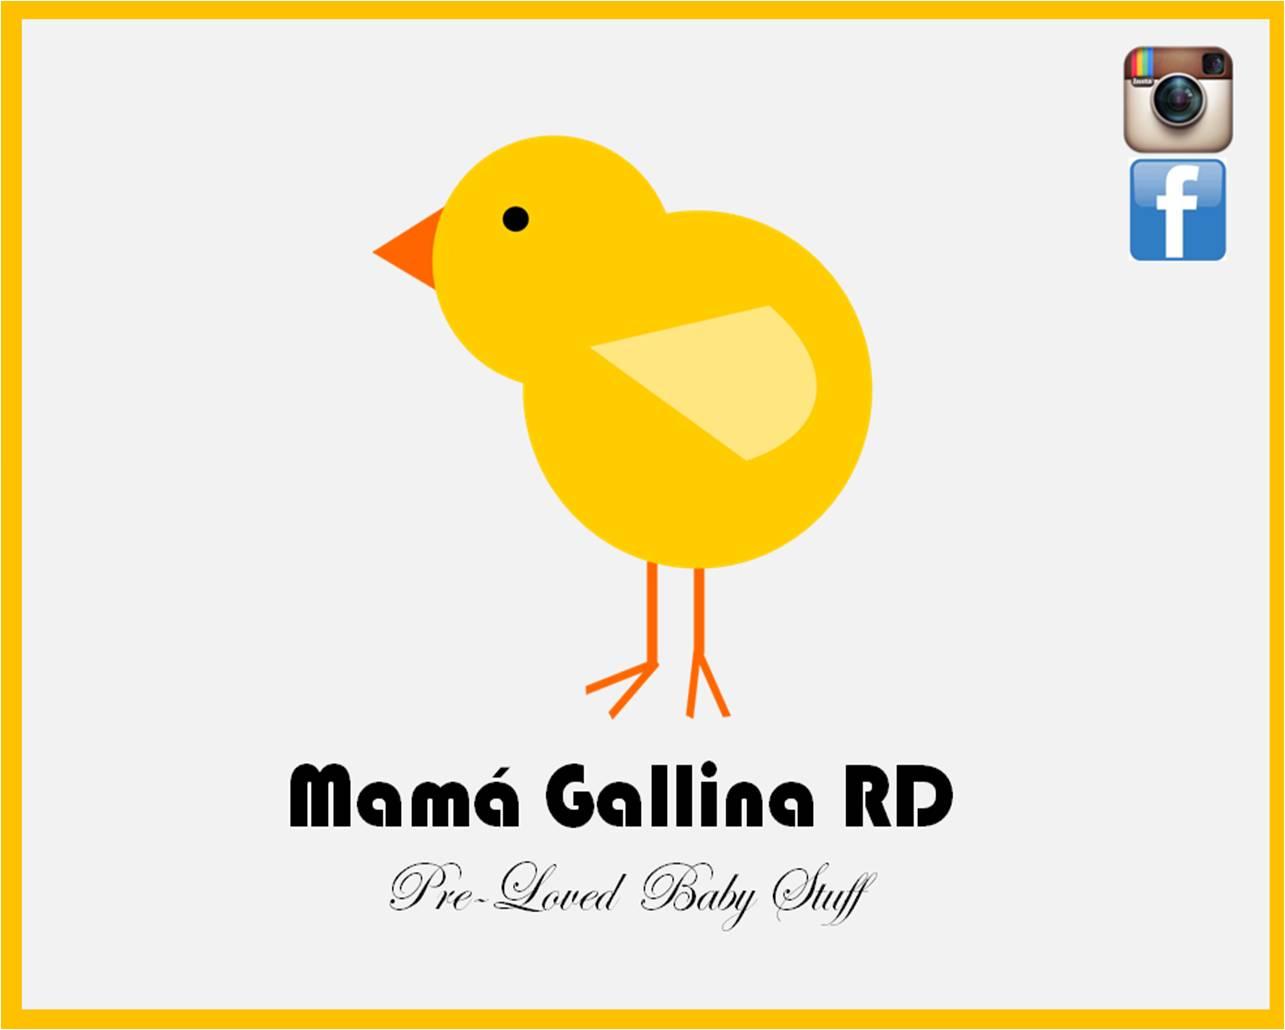 Mama Gallina